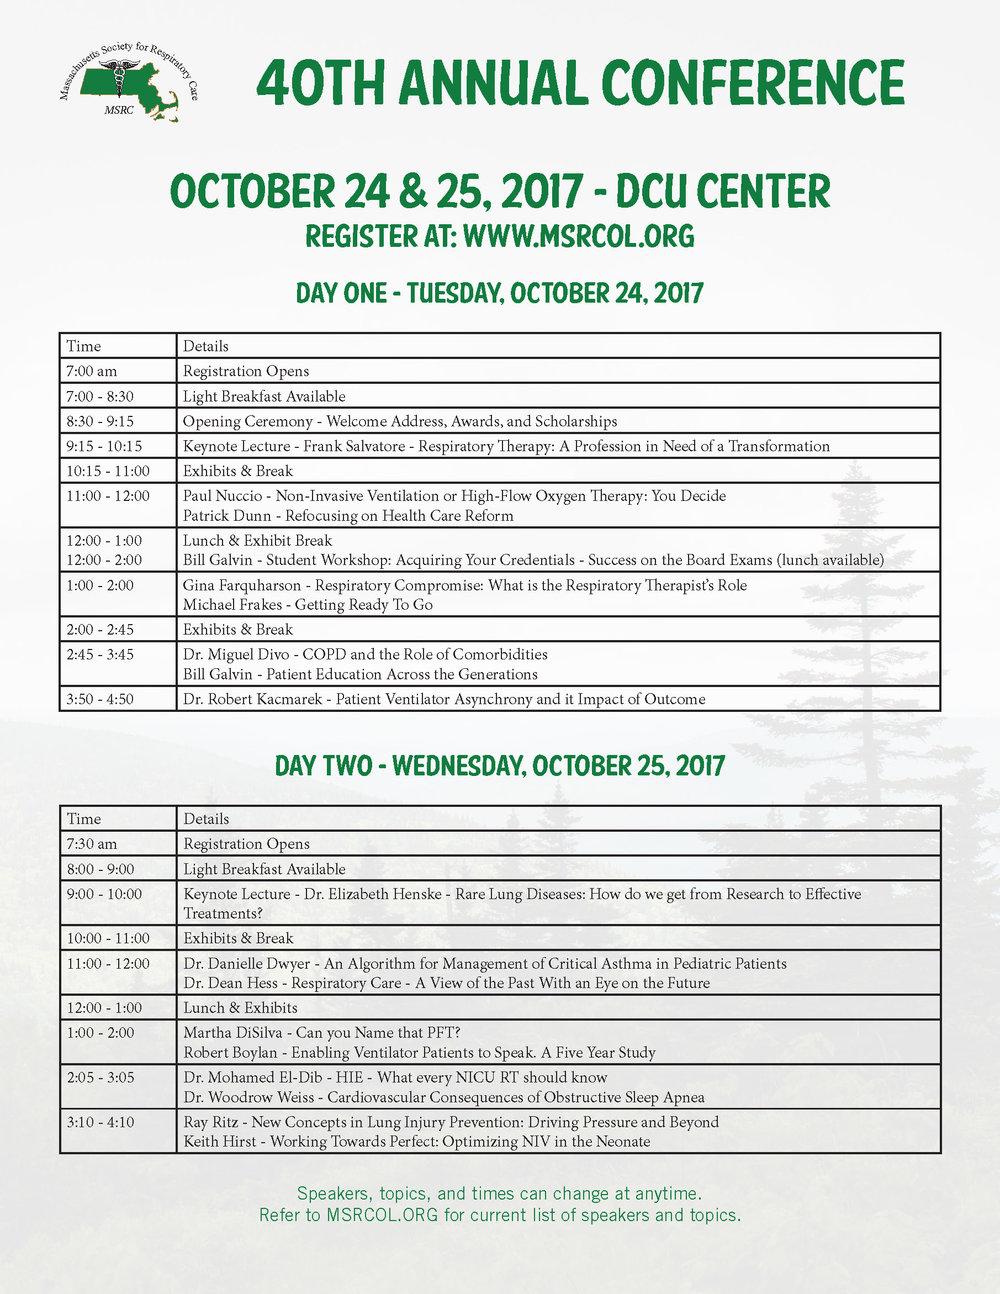 2017-MSRC_Agenda_Flyer_1.jpg